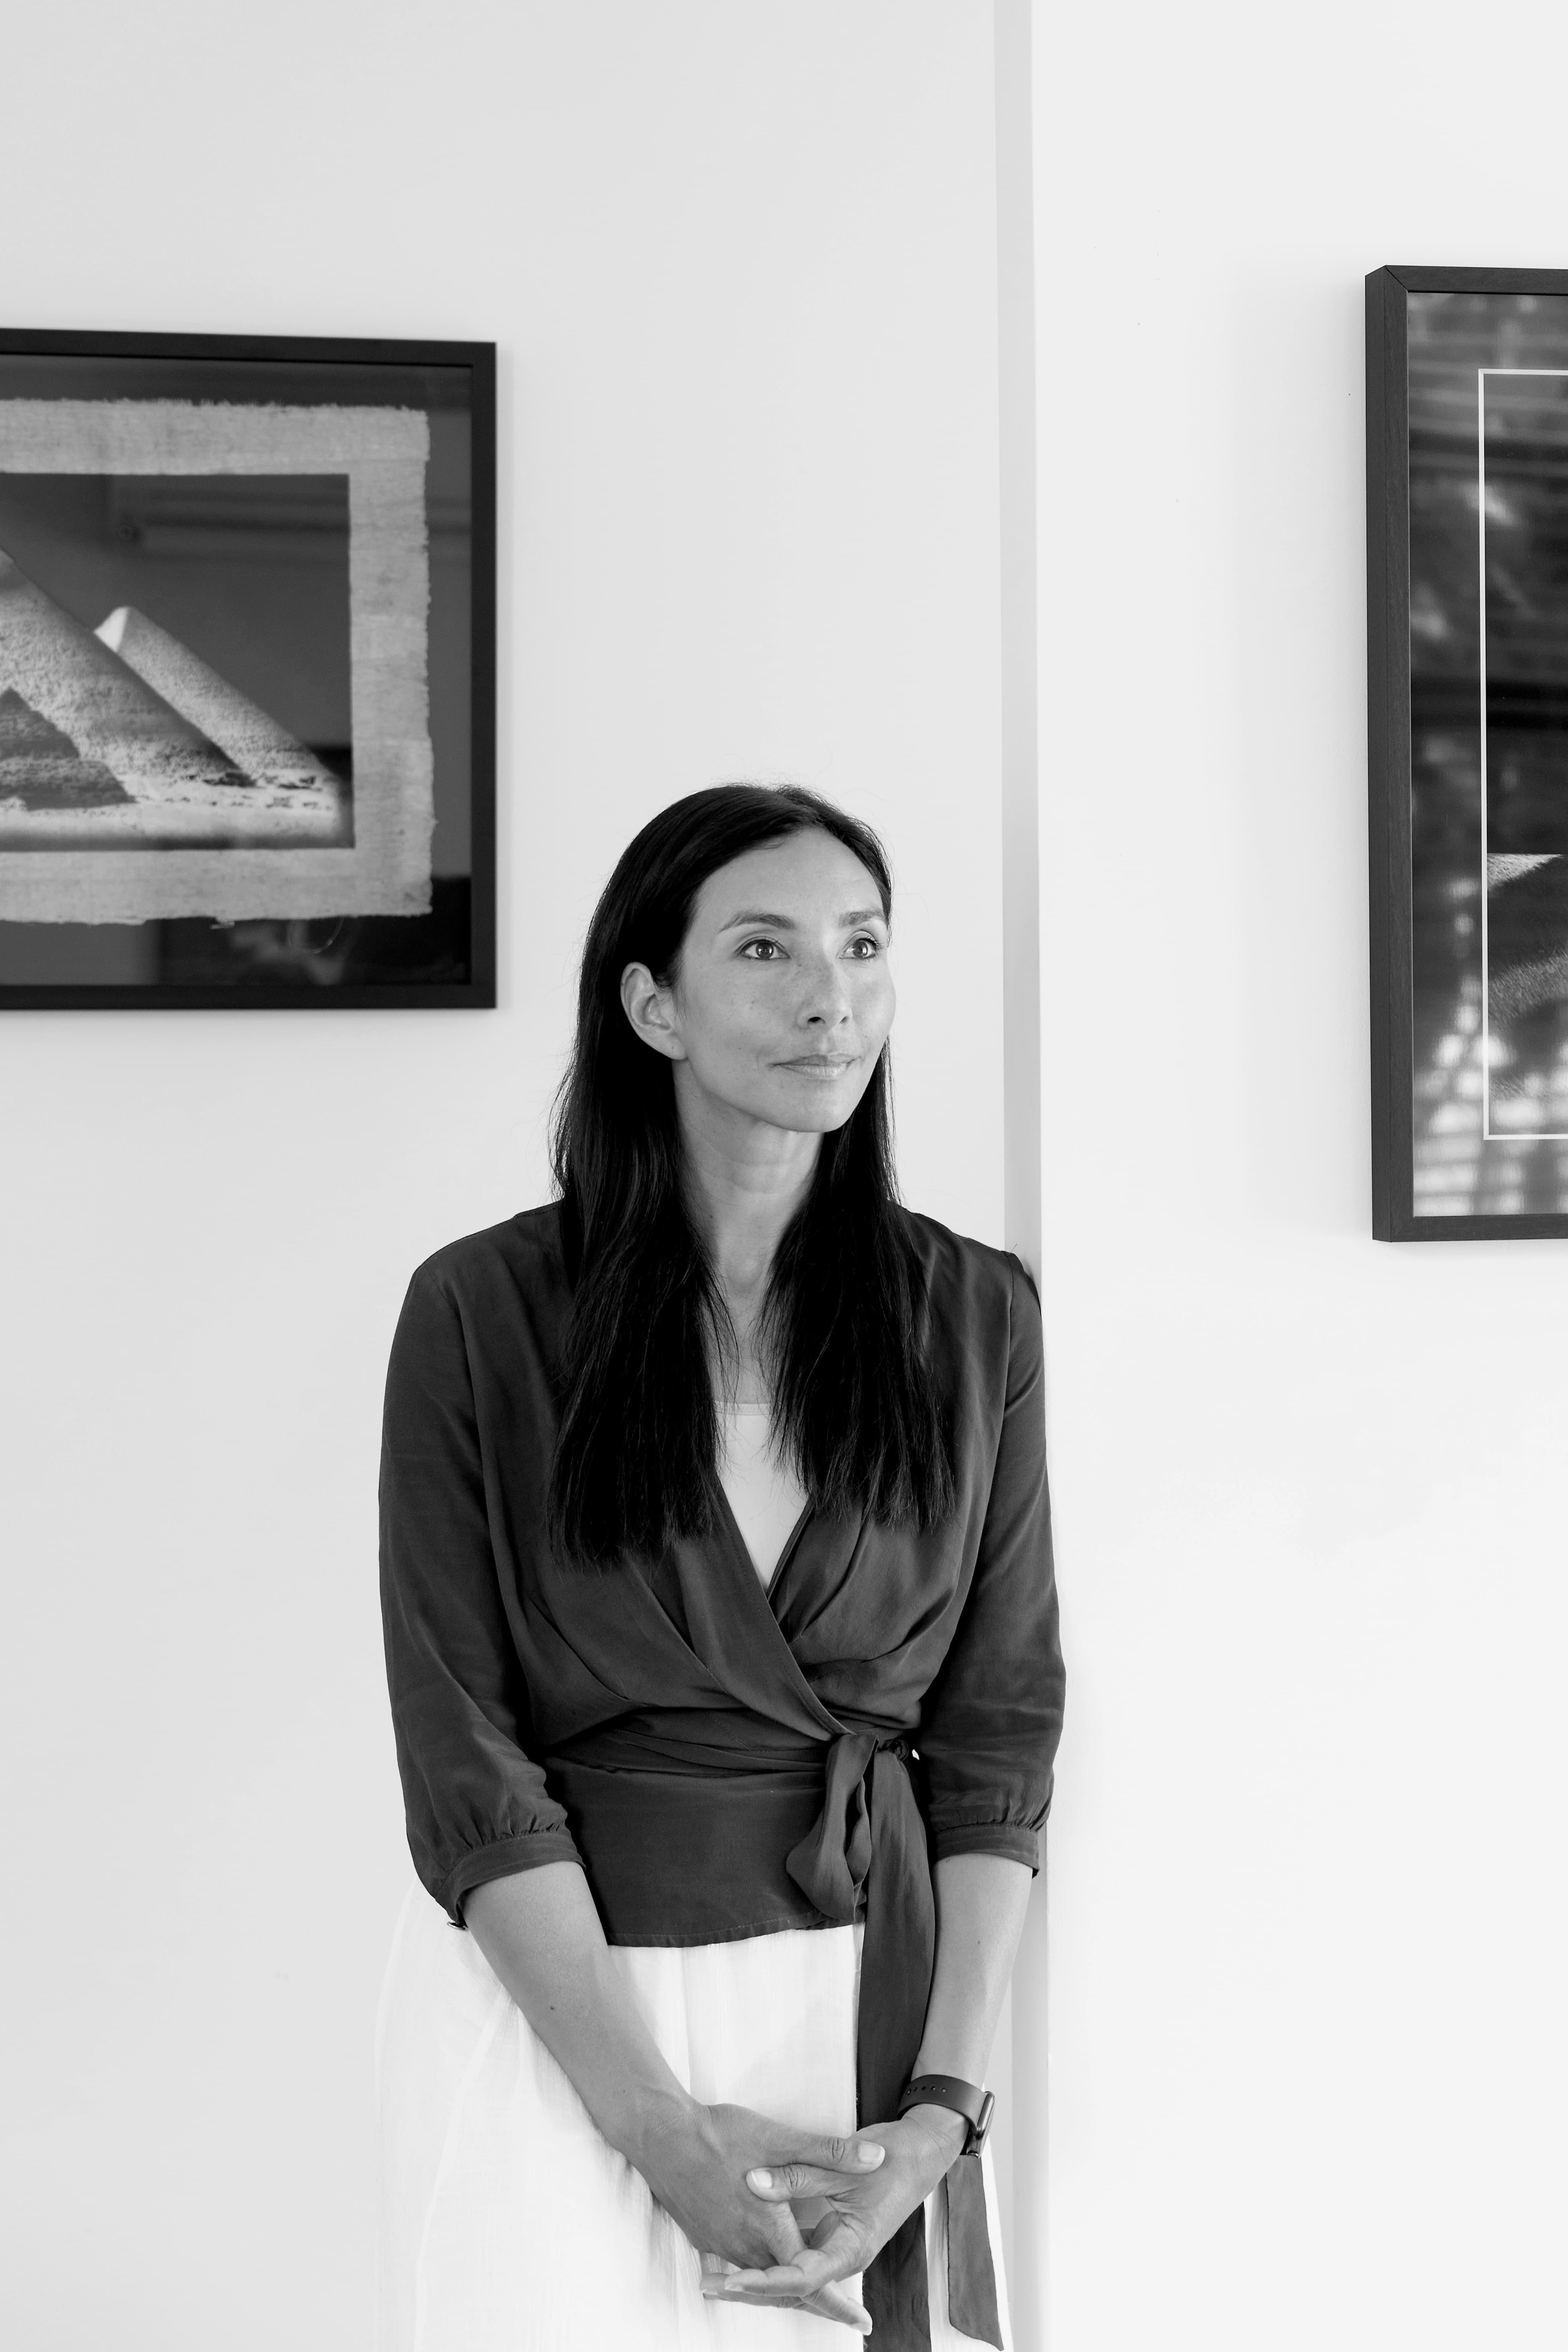 Michelle Dickinson